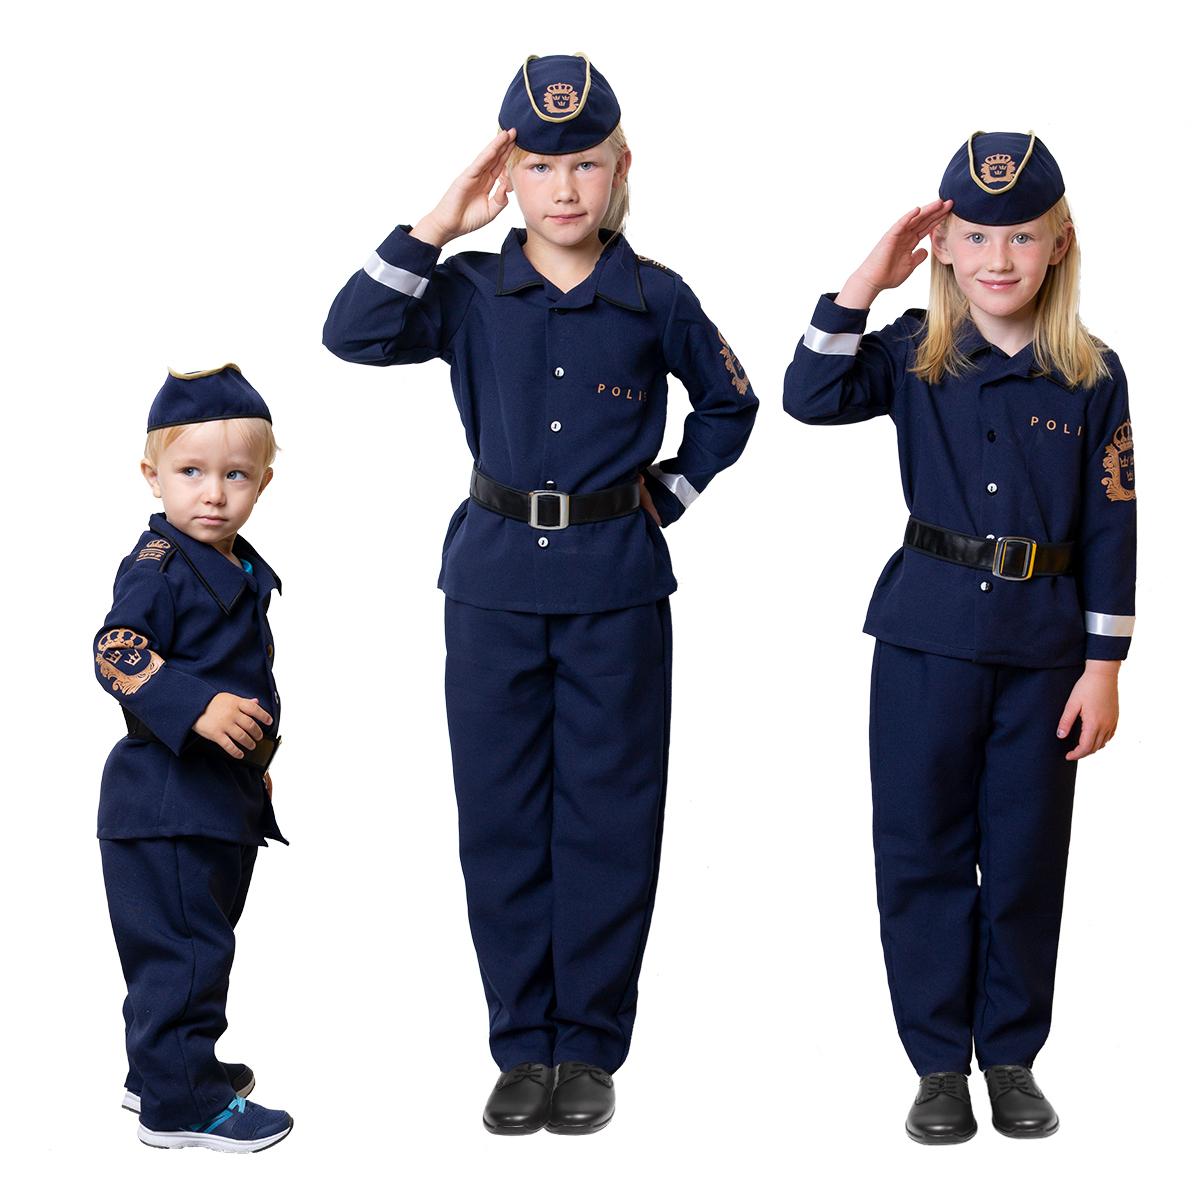 barn i uniform polisdräkt